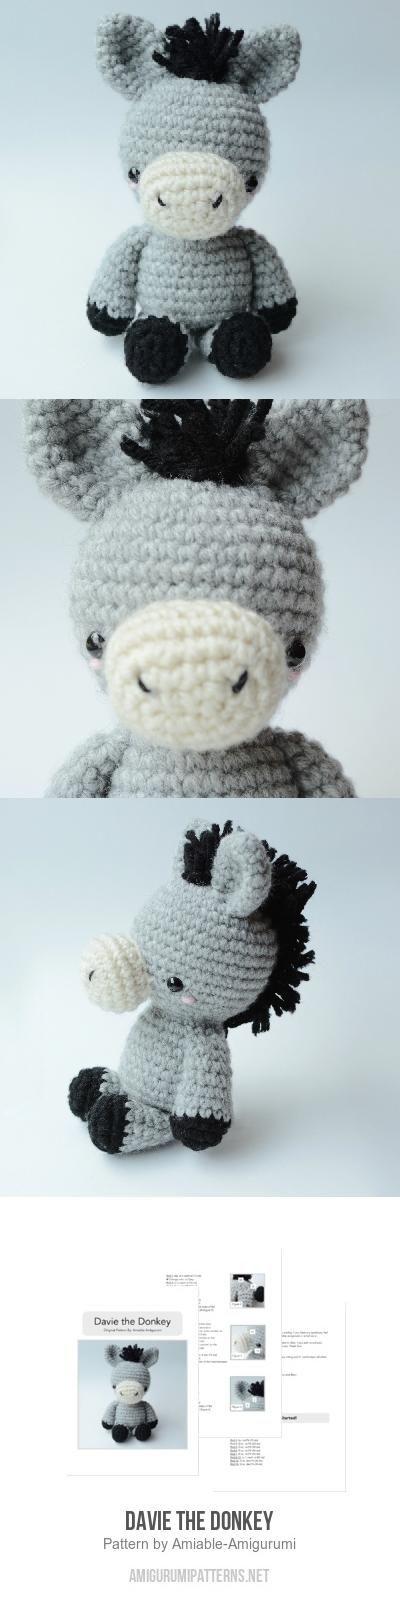 Davie The Donkey Amigurumi Pattern